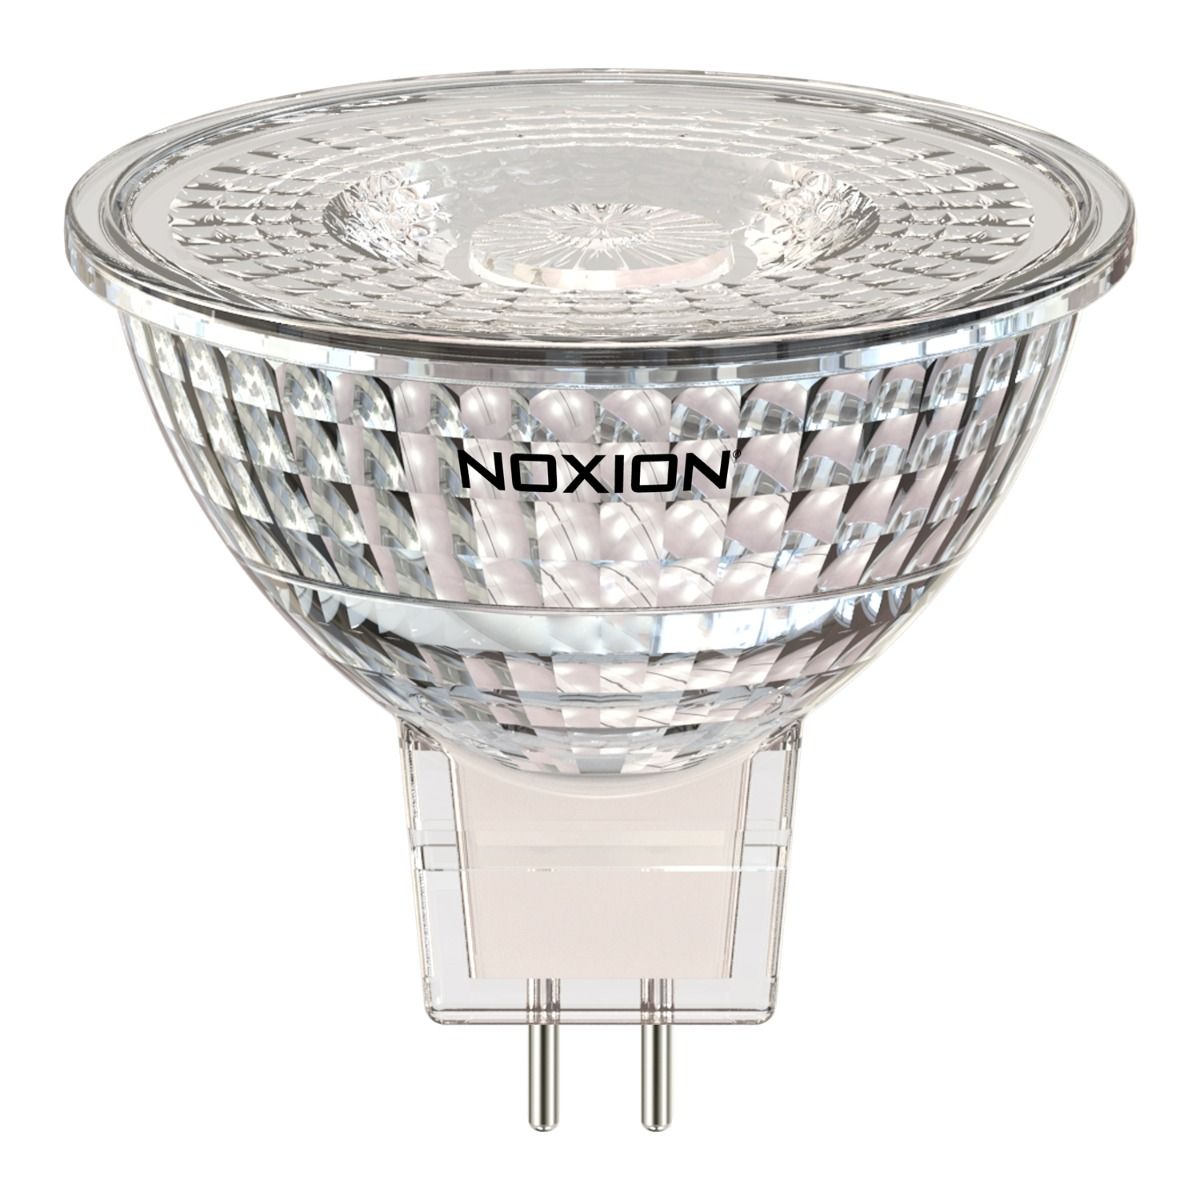 Noxion LED Spot GU5.3 5W 830 60D 470lm | Dimbaar - Warm Wit - Vervangt 35W